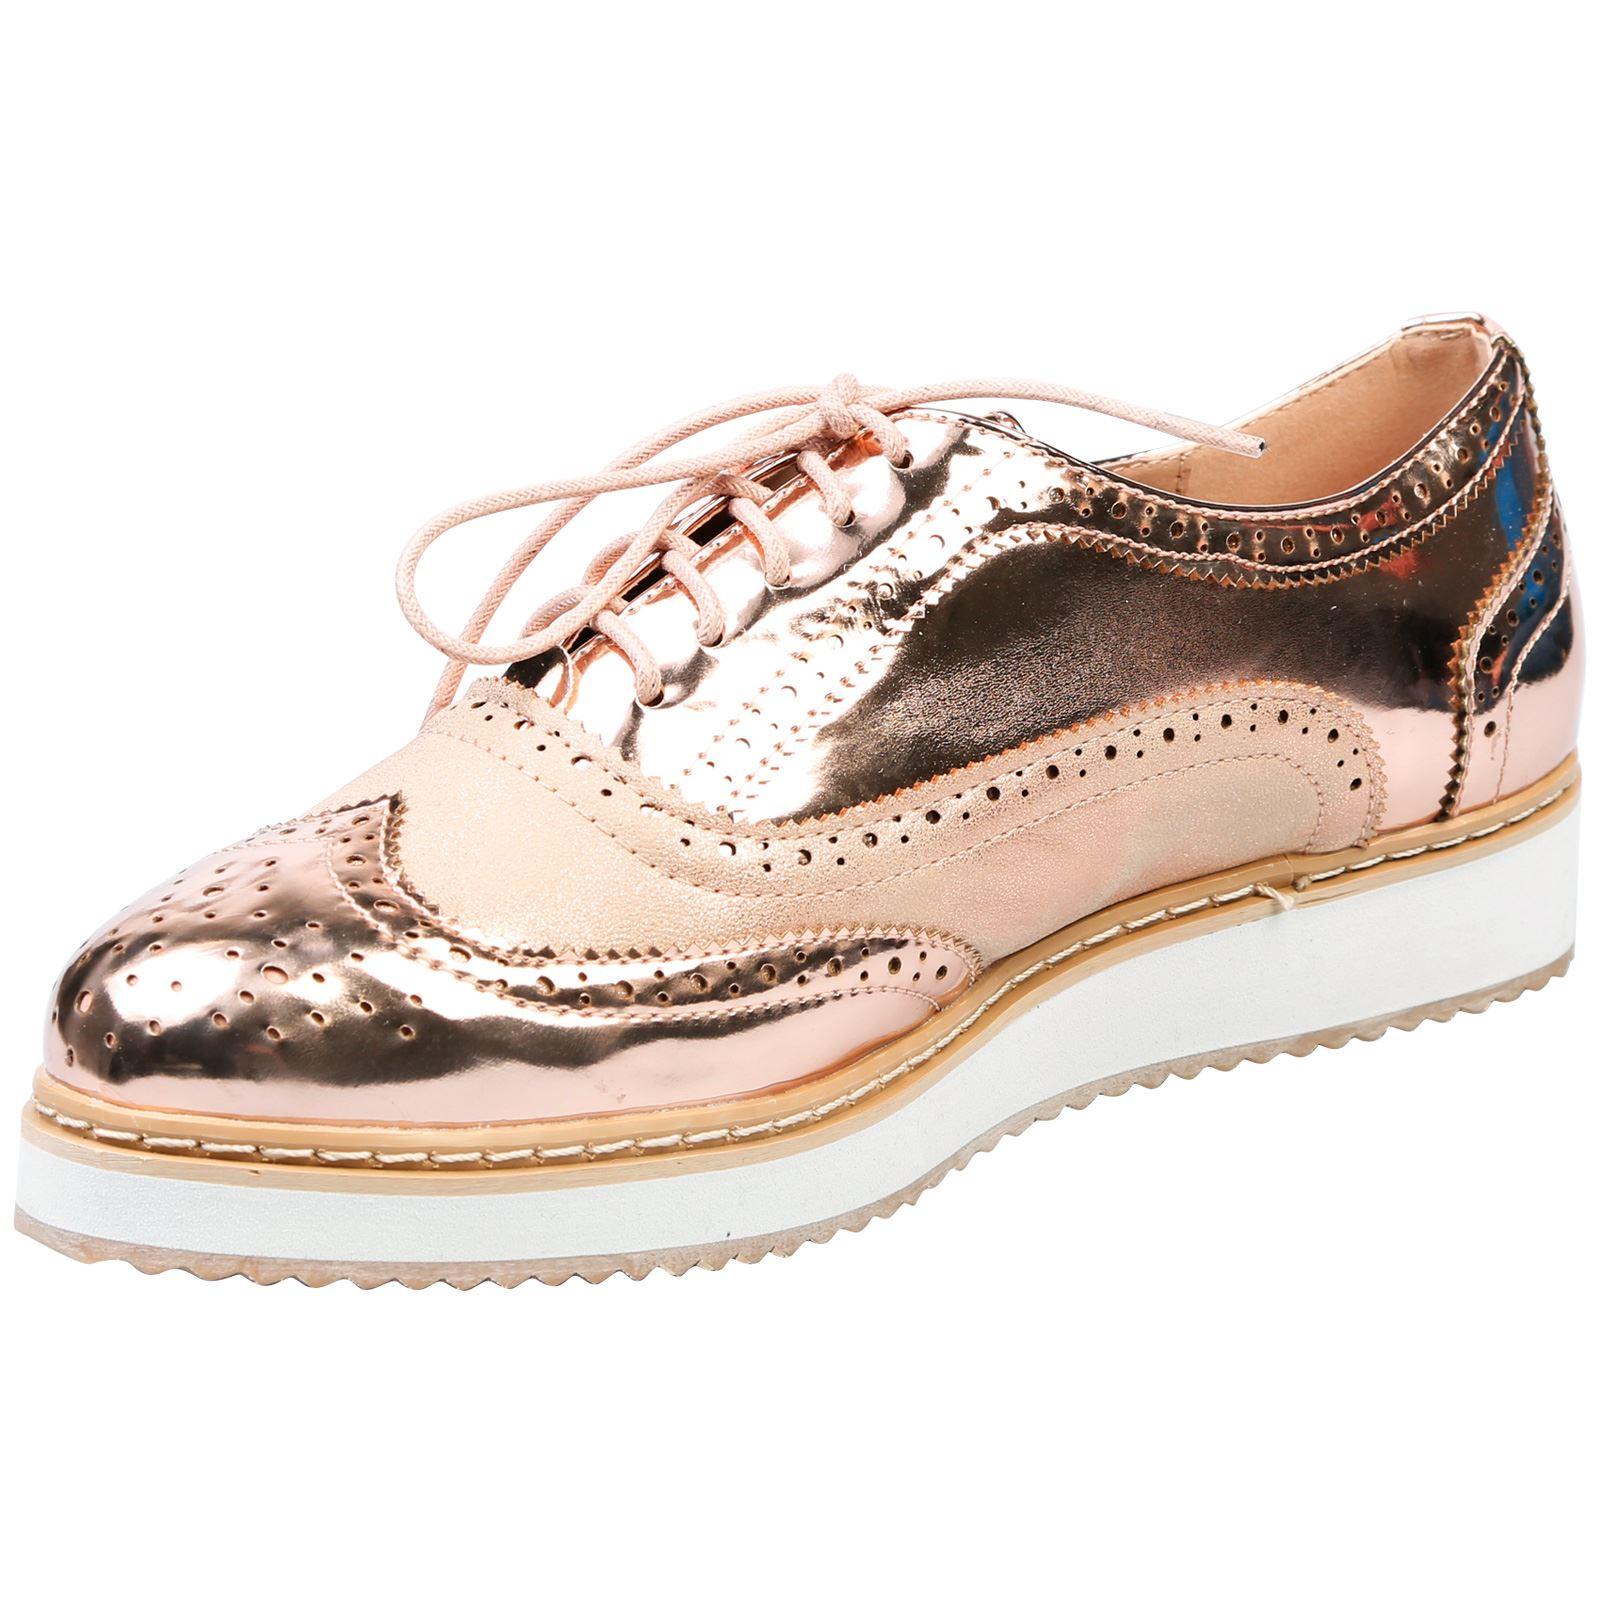 Bridget-Womens-Flats-Low-Heel-Wedges-Flatforms-Lace-Up-Brogues-Ladies-Shoes-Size